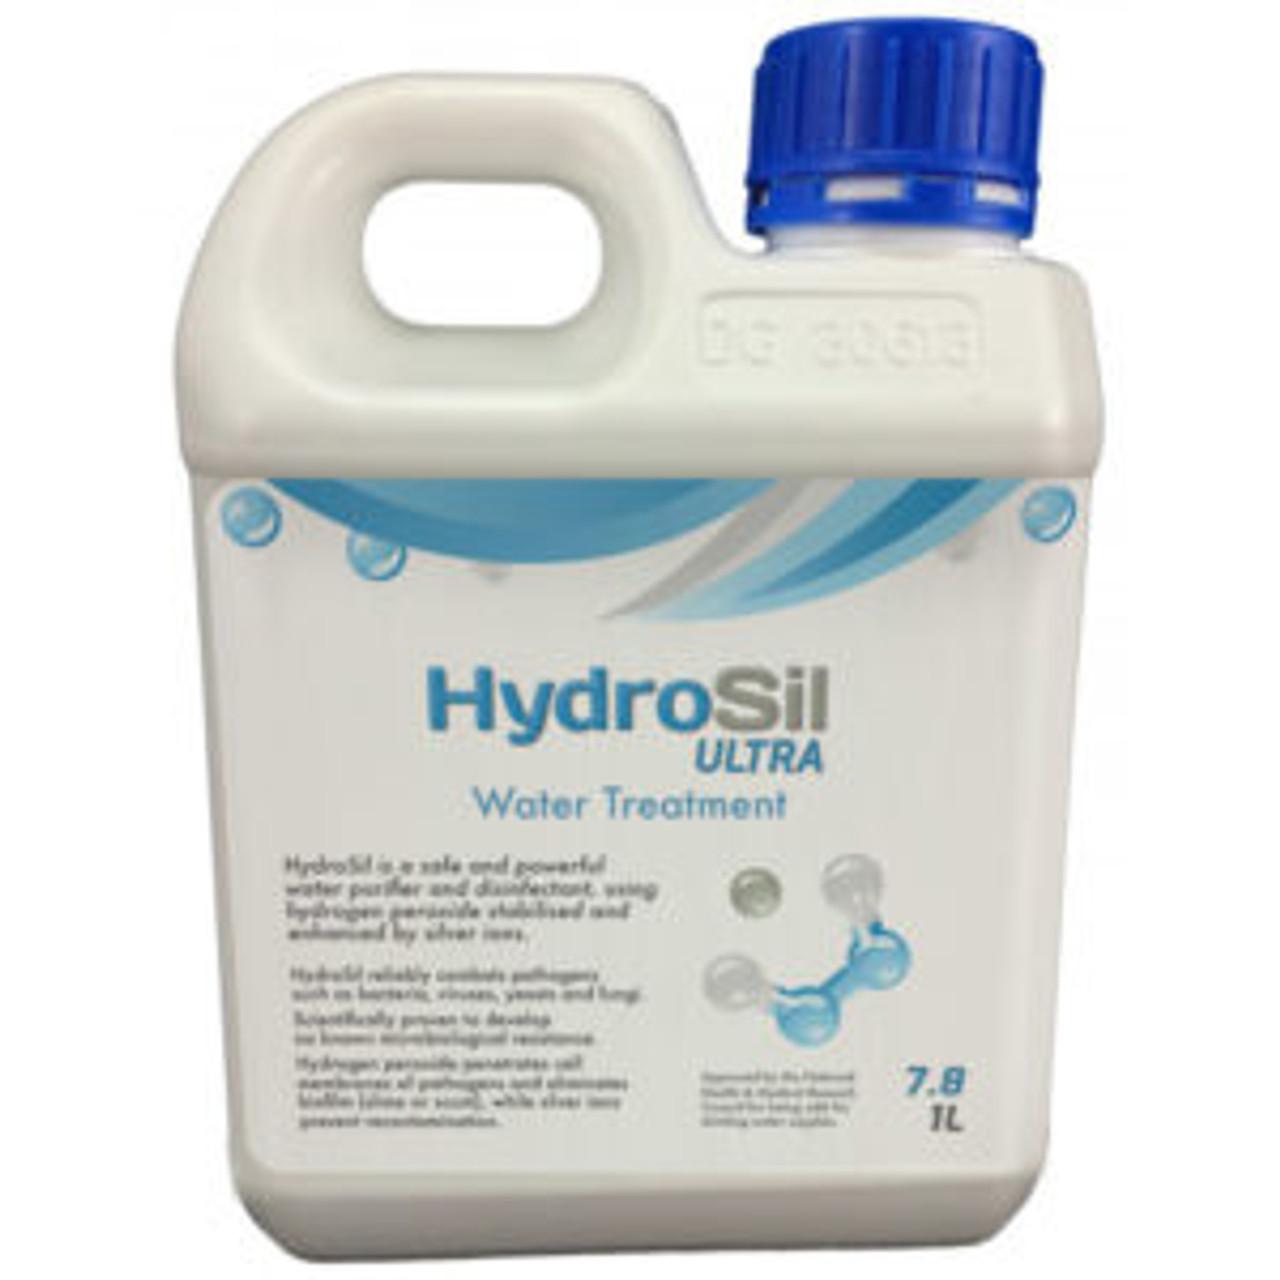 HydroSil Ultra 7.8% Australian Made water sanitizer